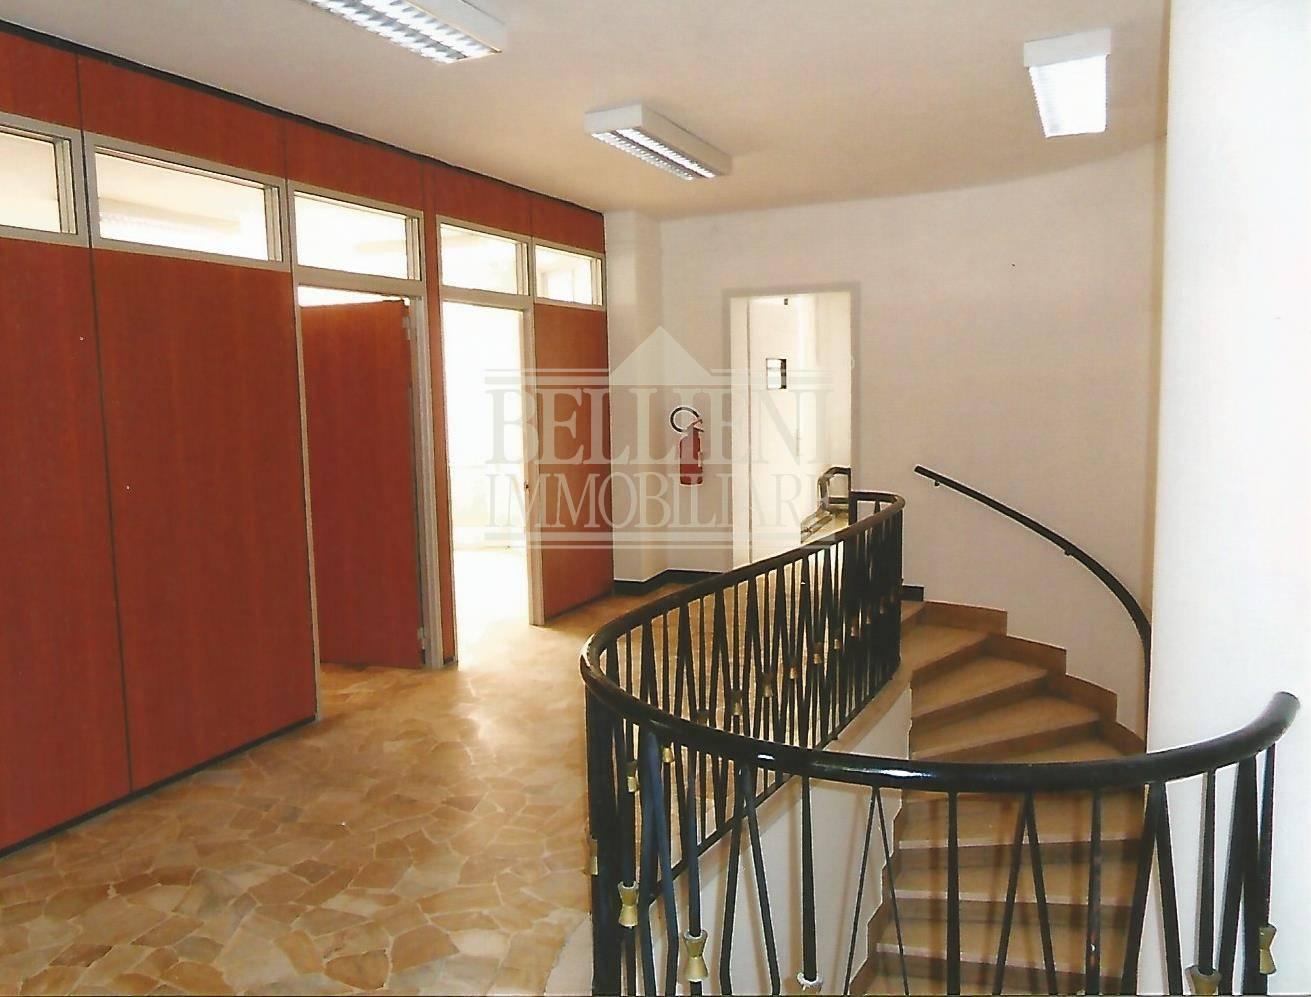 Ufficio in Affitto/Vendita a Vicenza Cod. U09